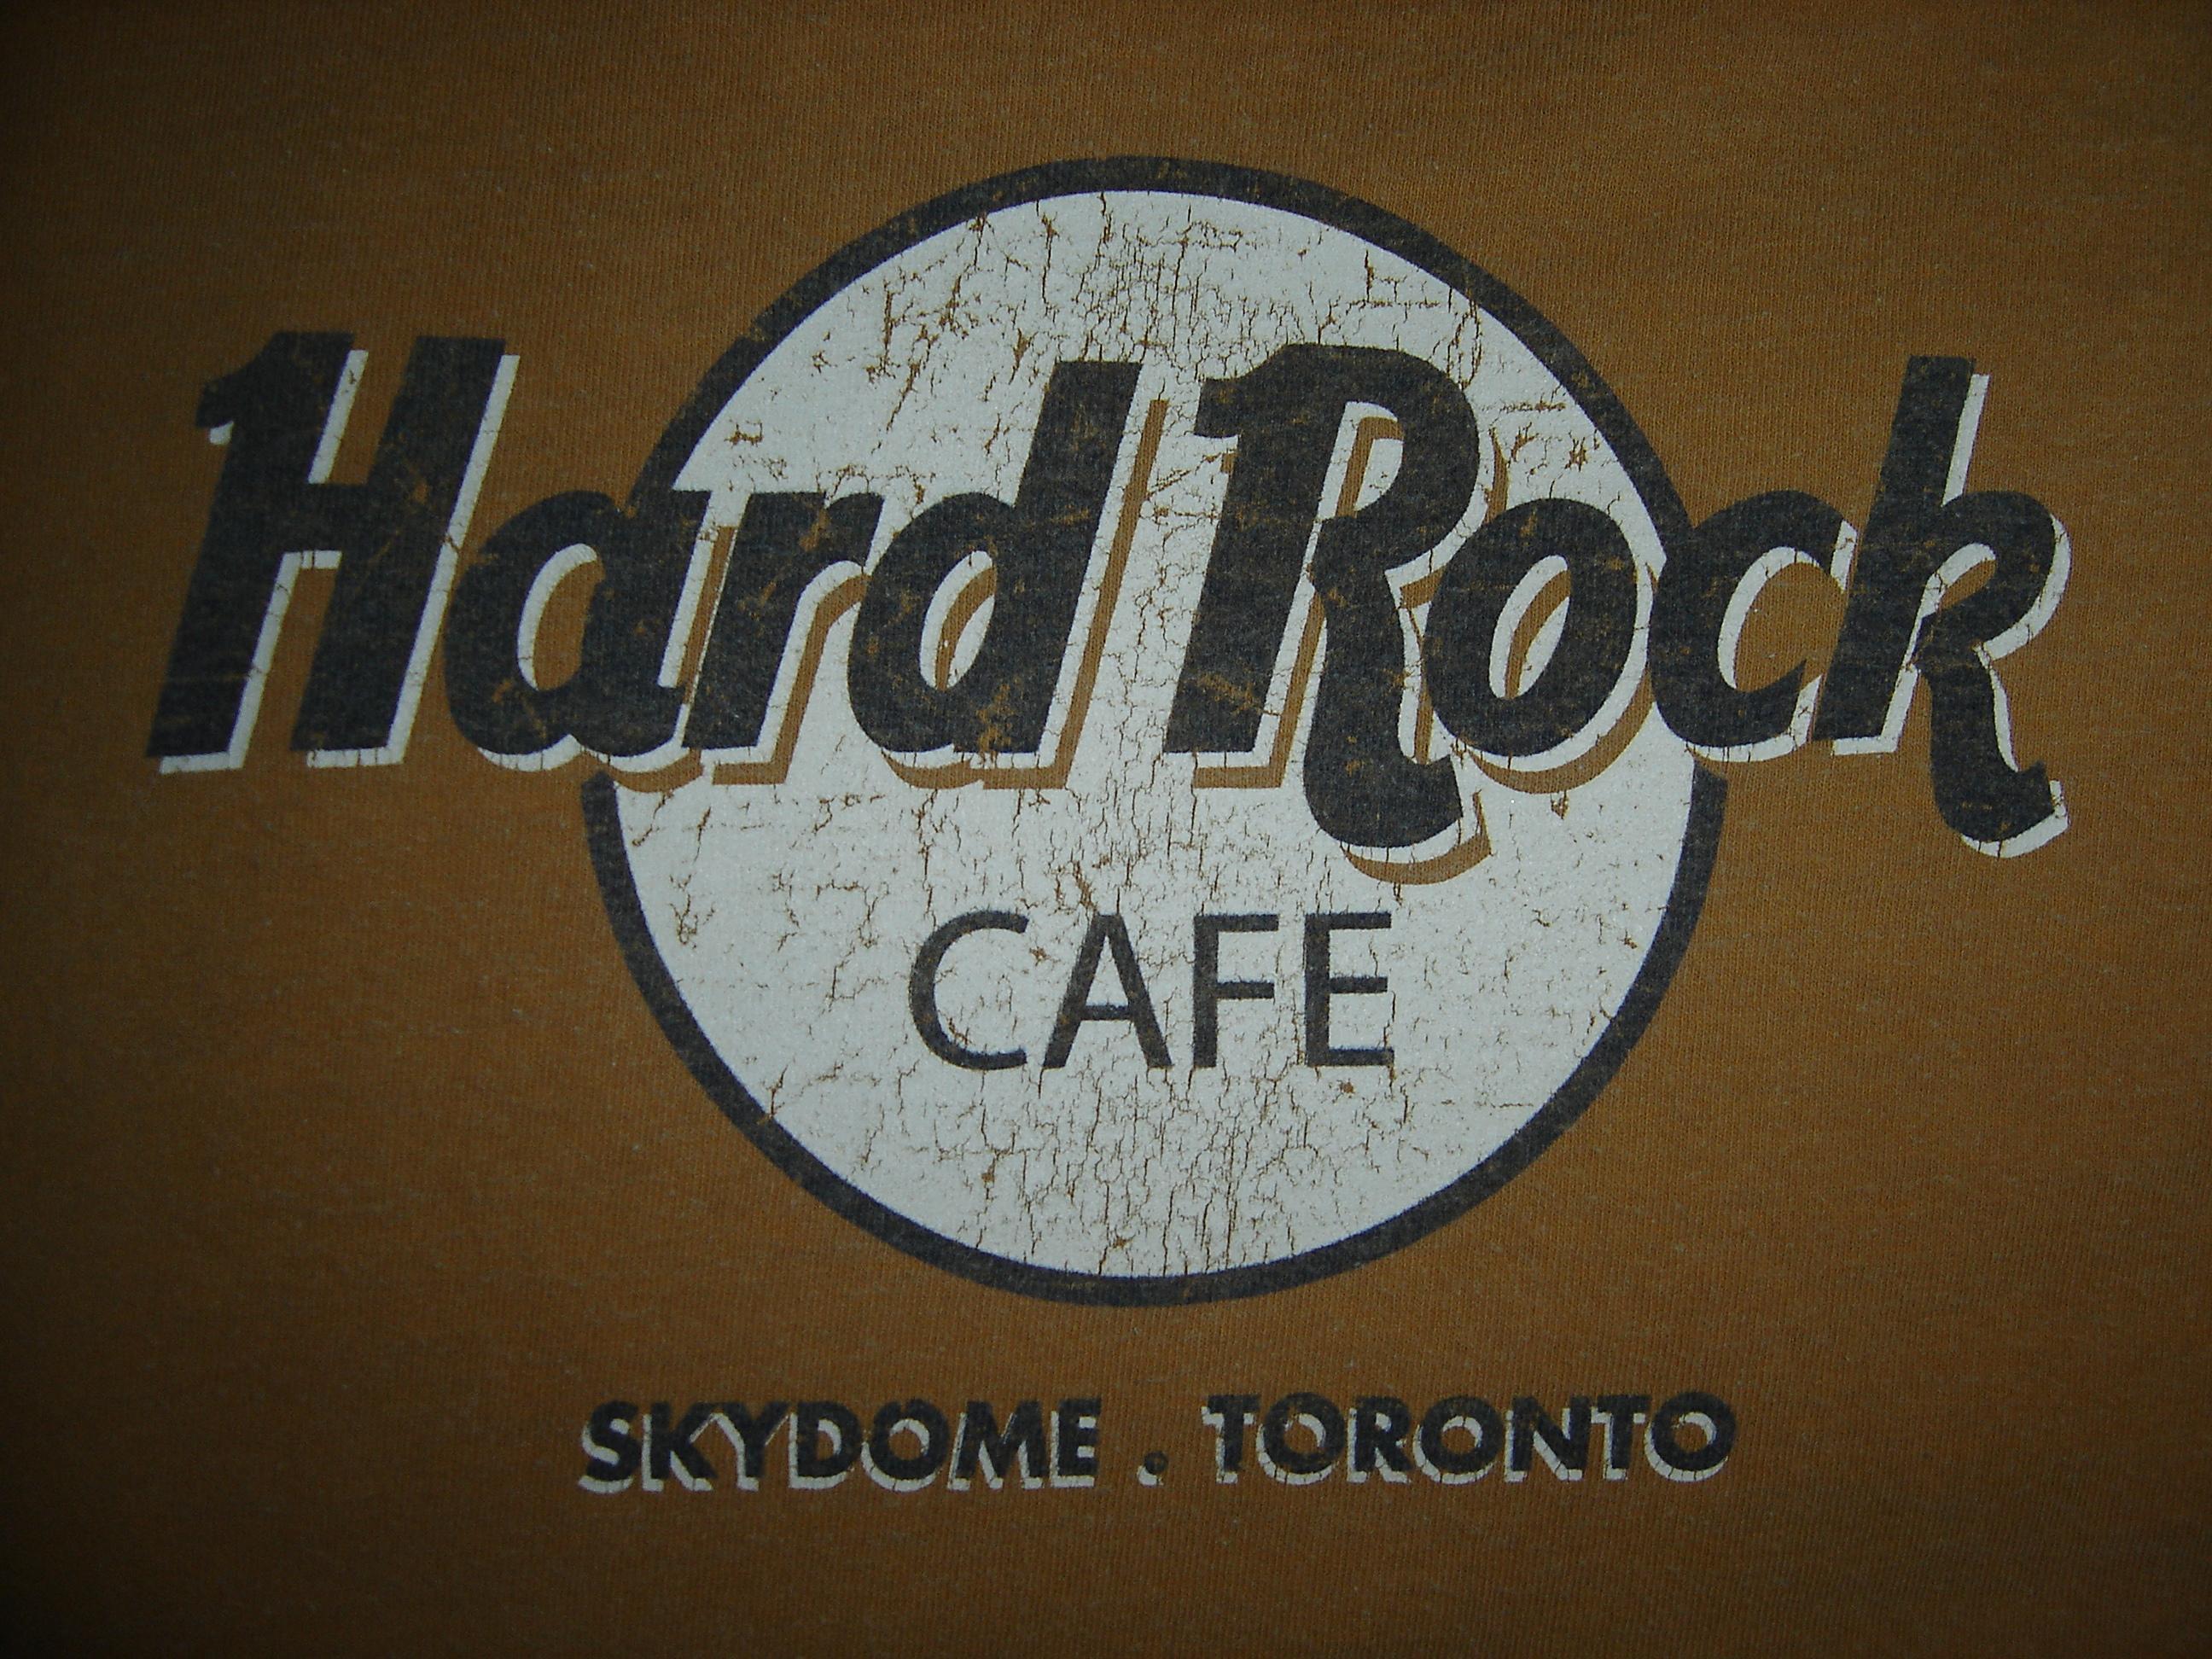 Hard Rock Cafe Skydome